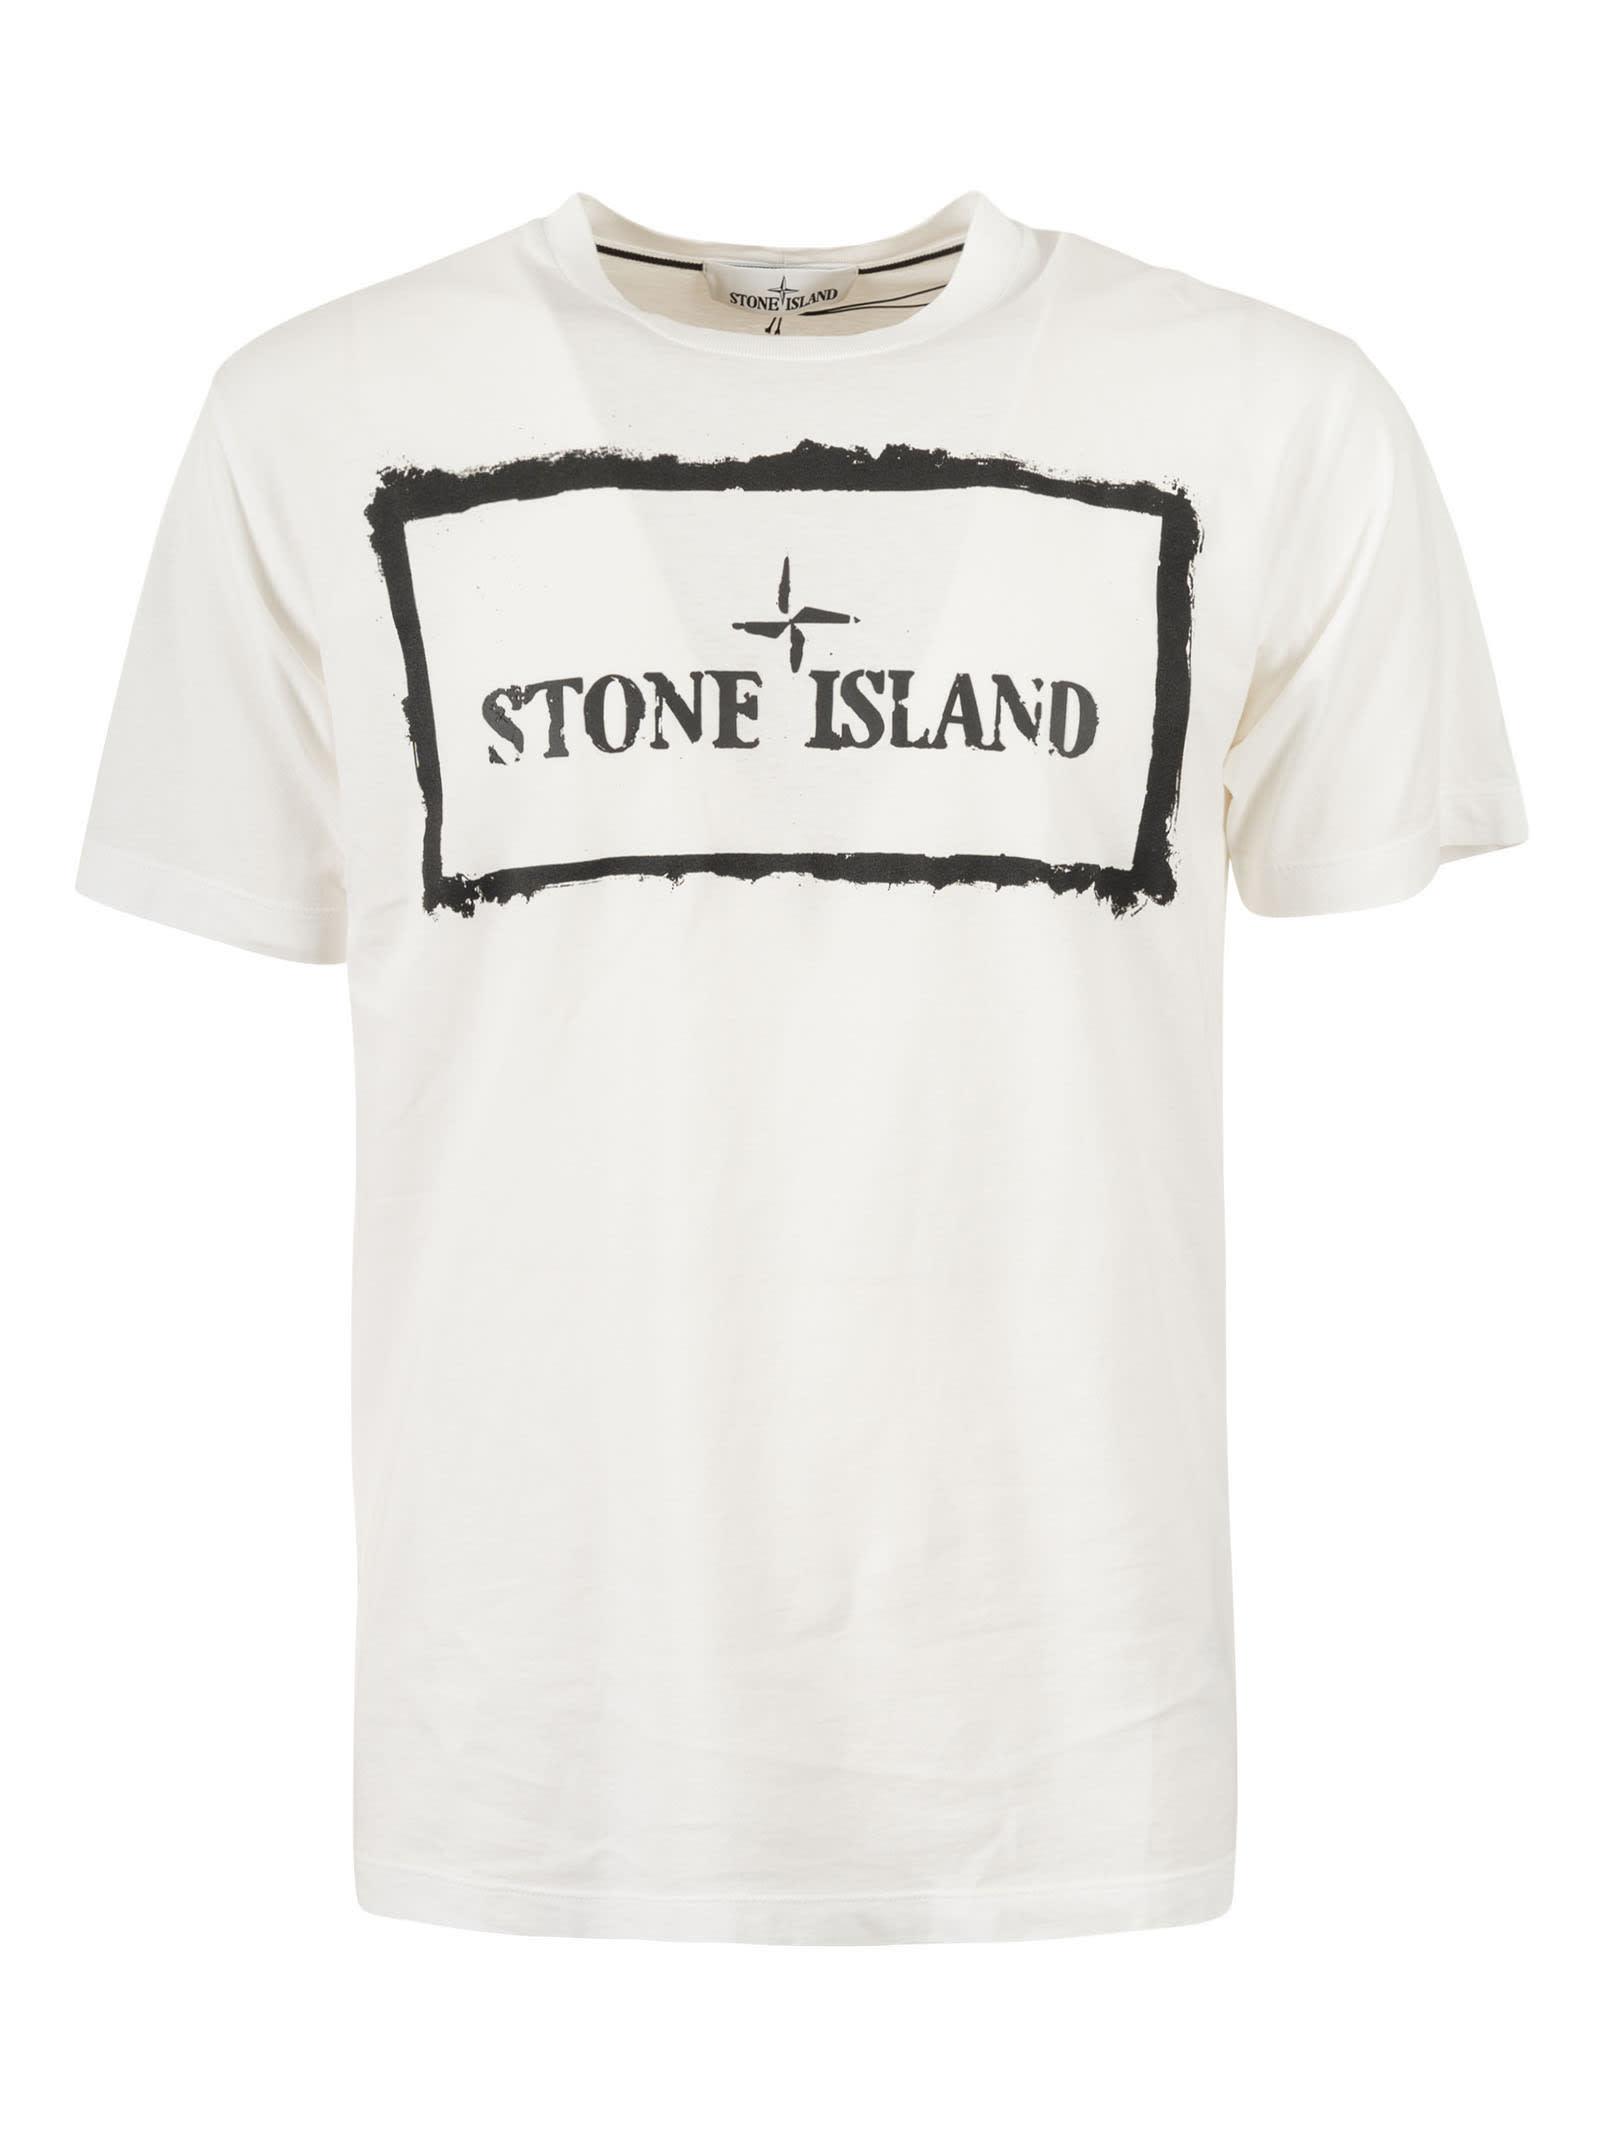 Stone Island REAR & FRONT LOGO T-SHIRT